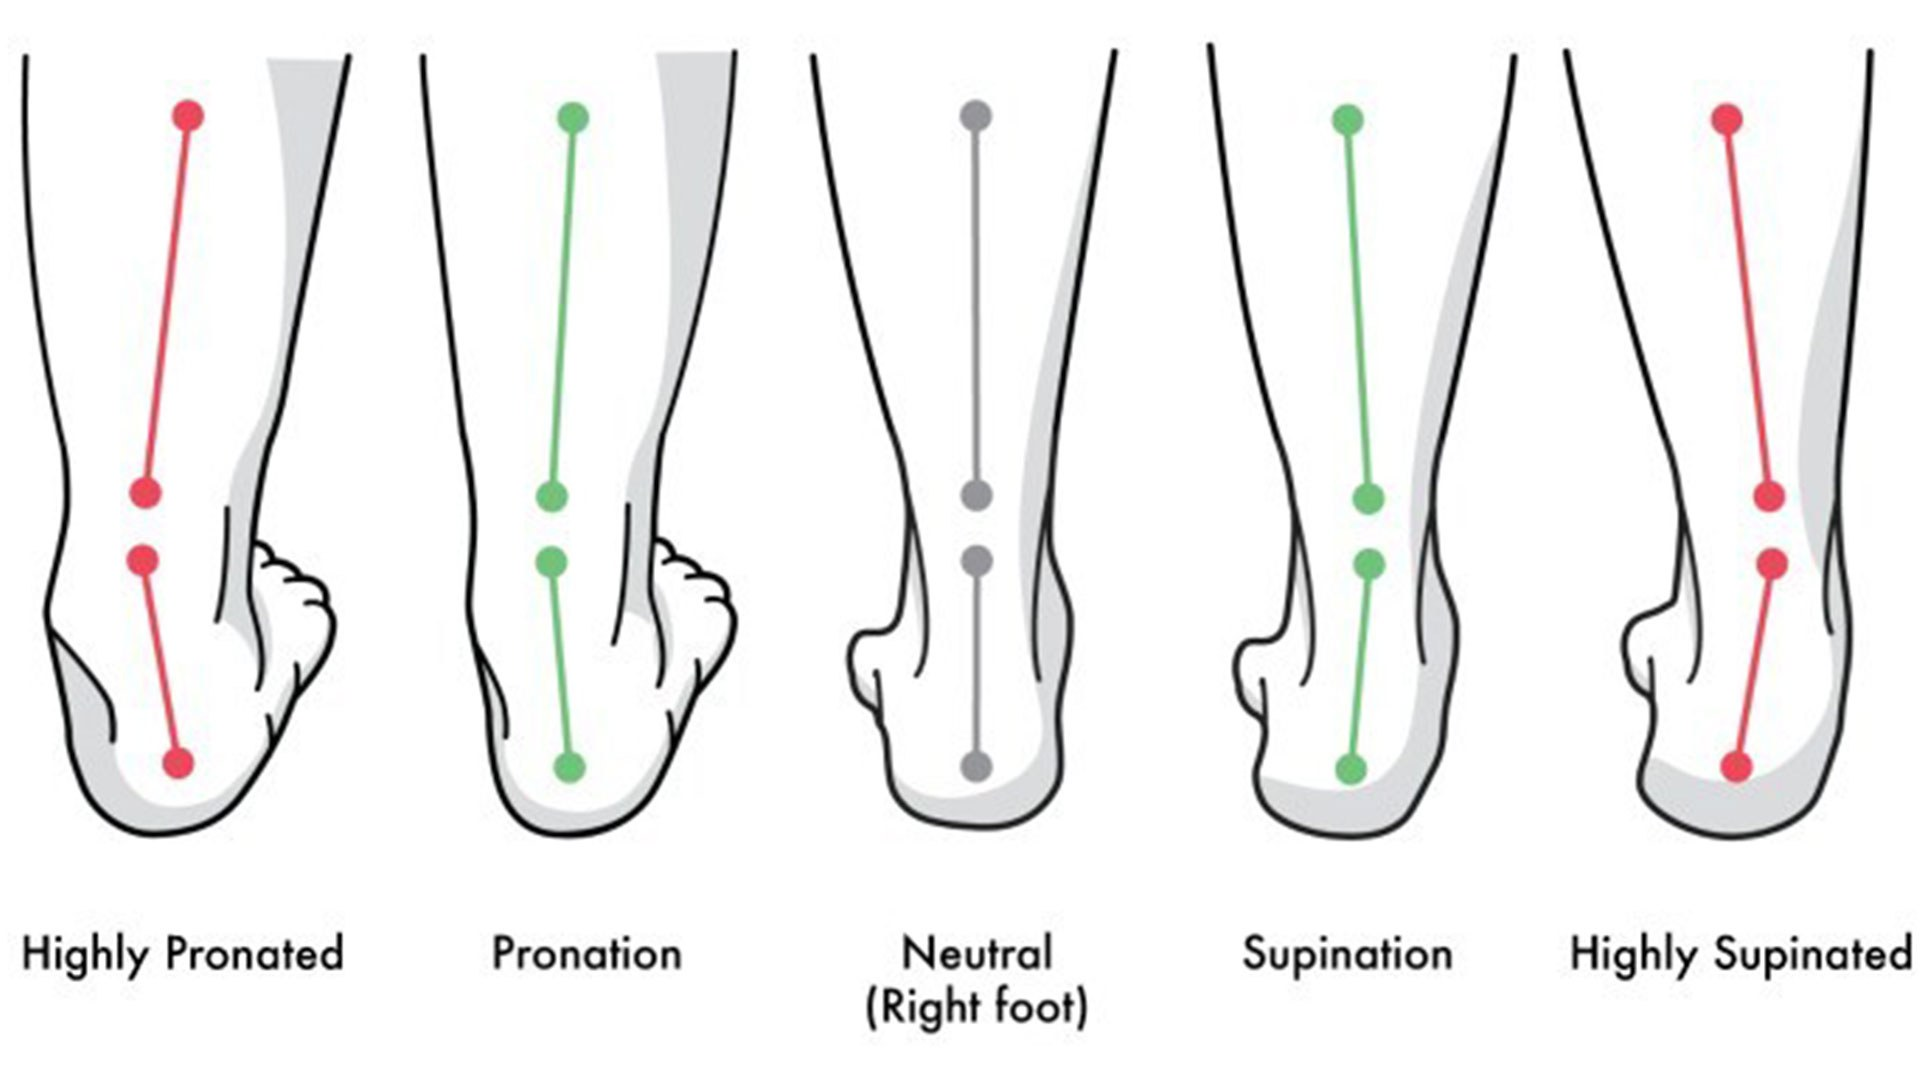 Pronation scale